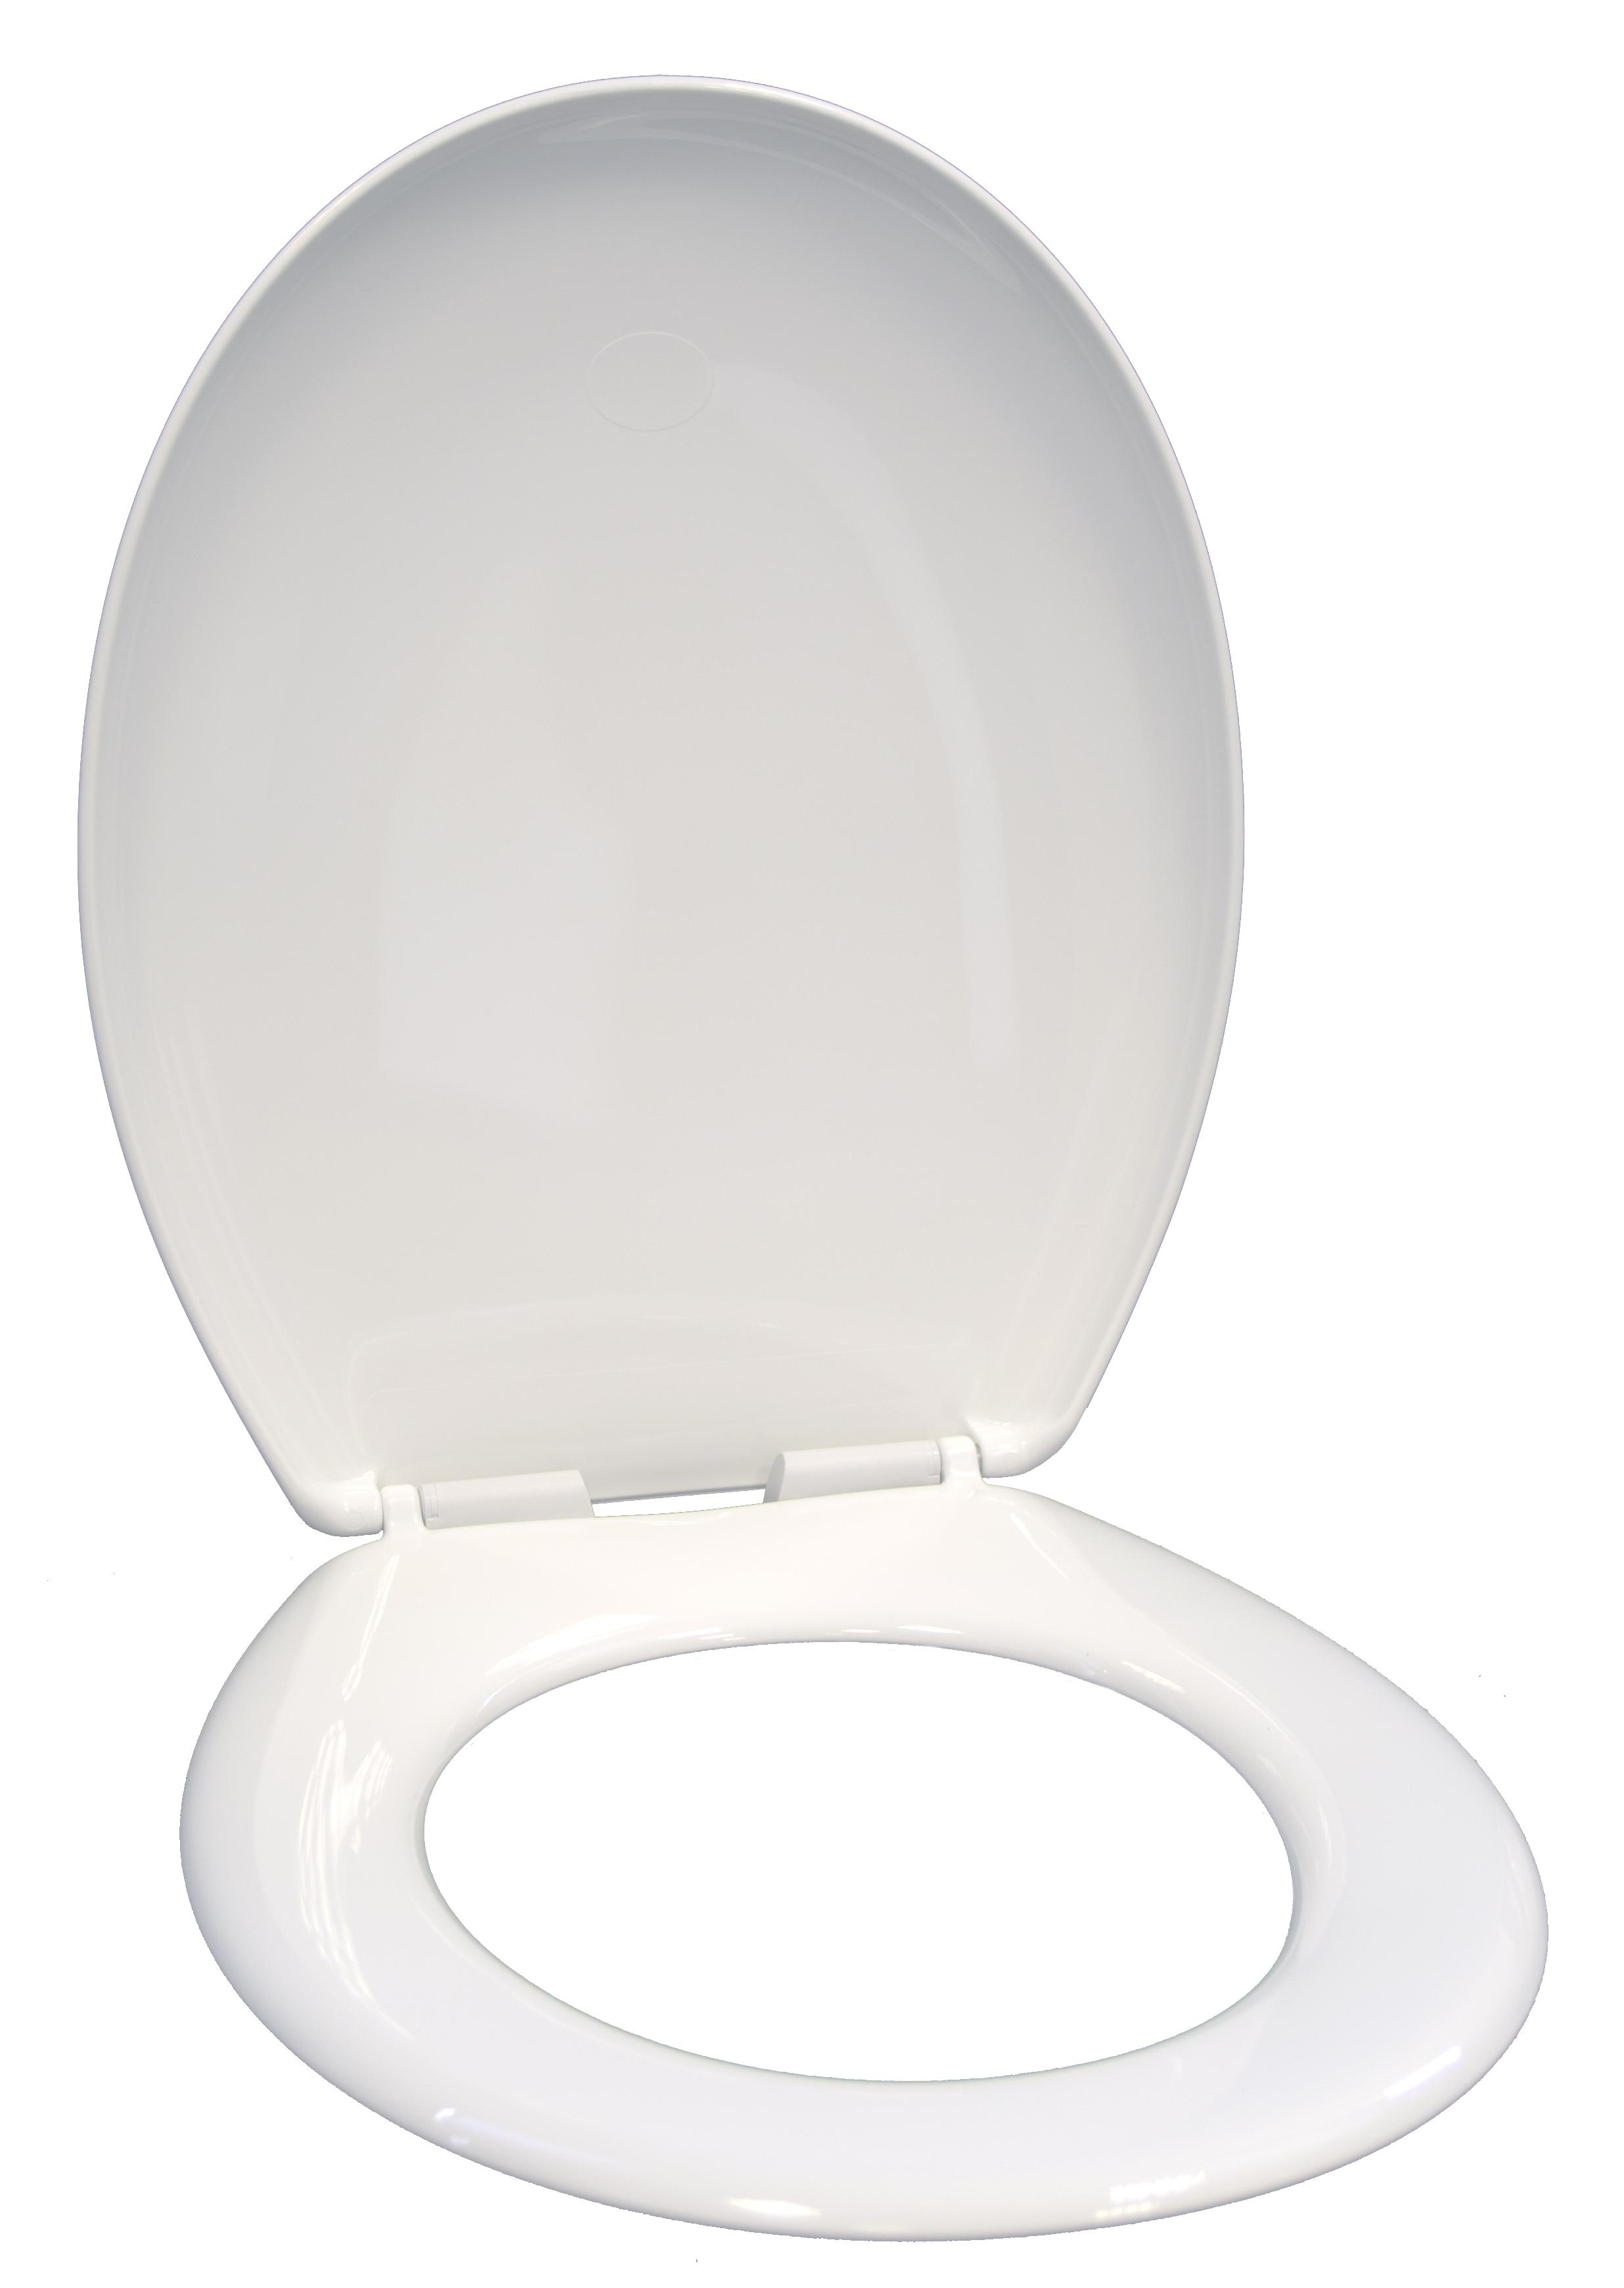 Lecico   Atlas   STWHSSUNP   Toilet Seat